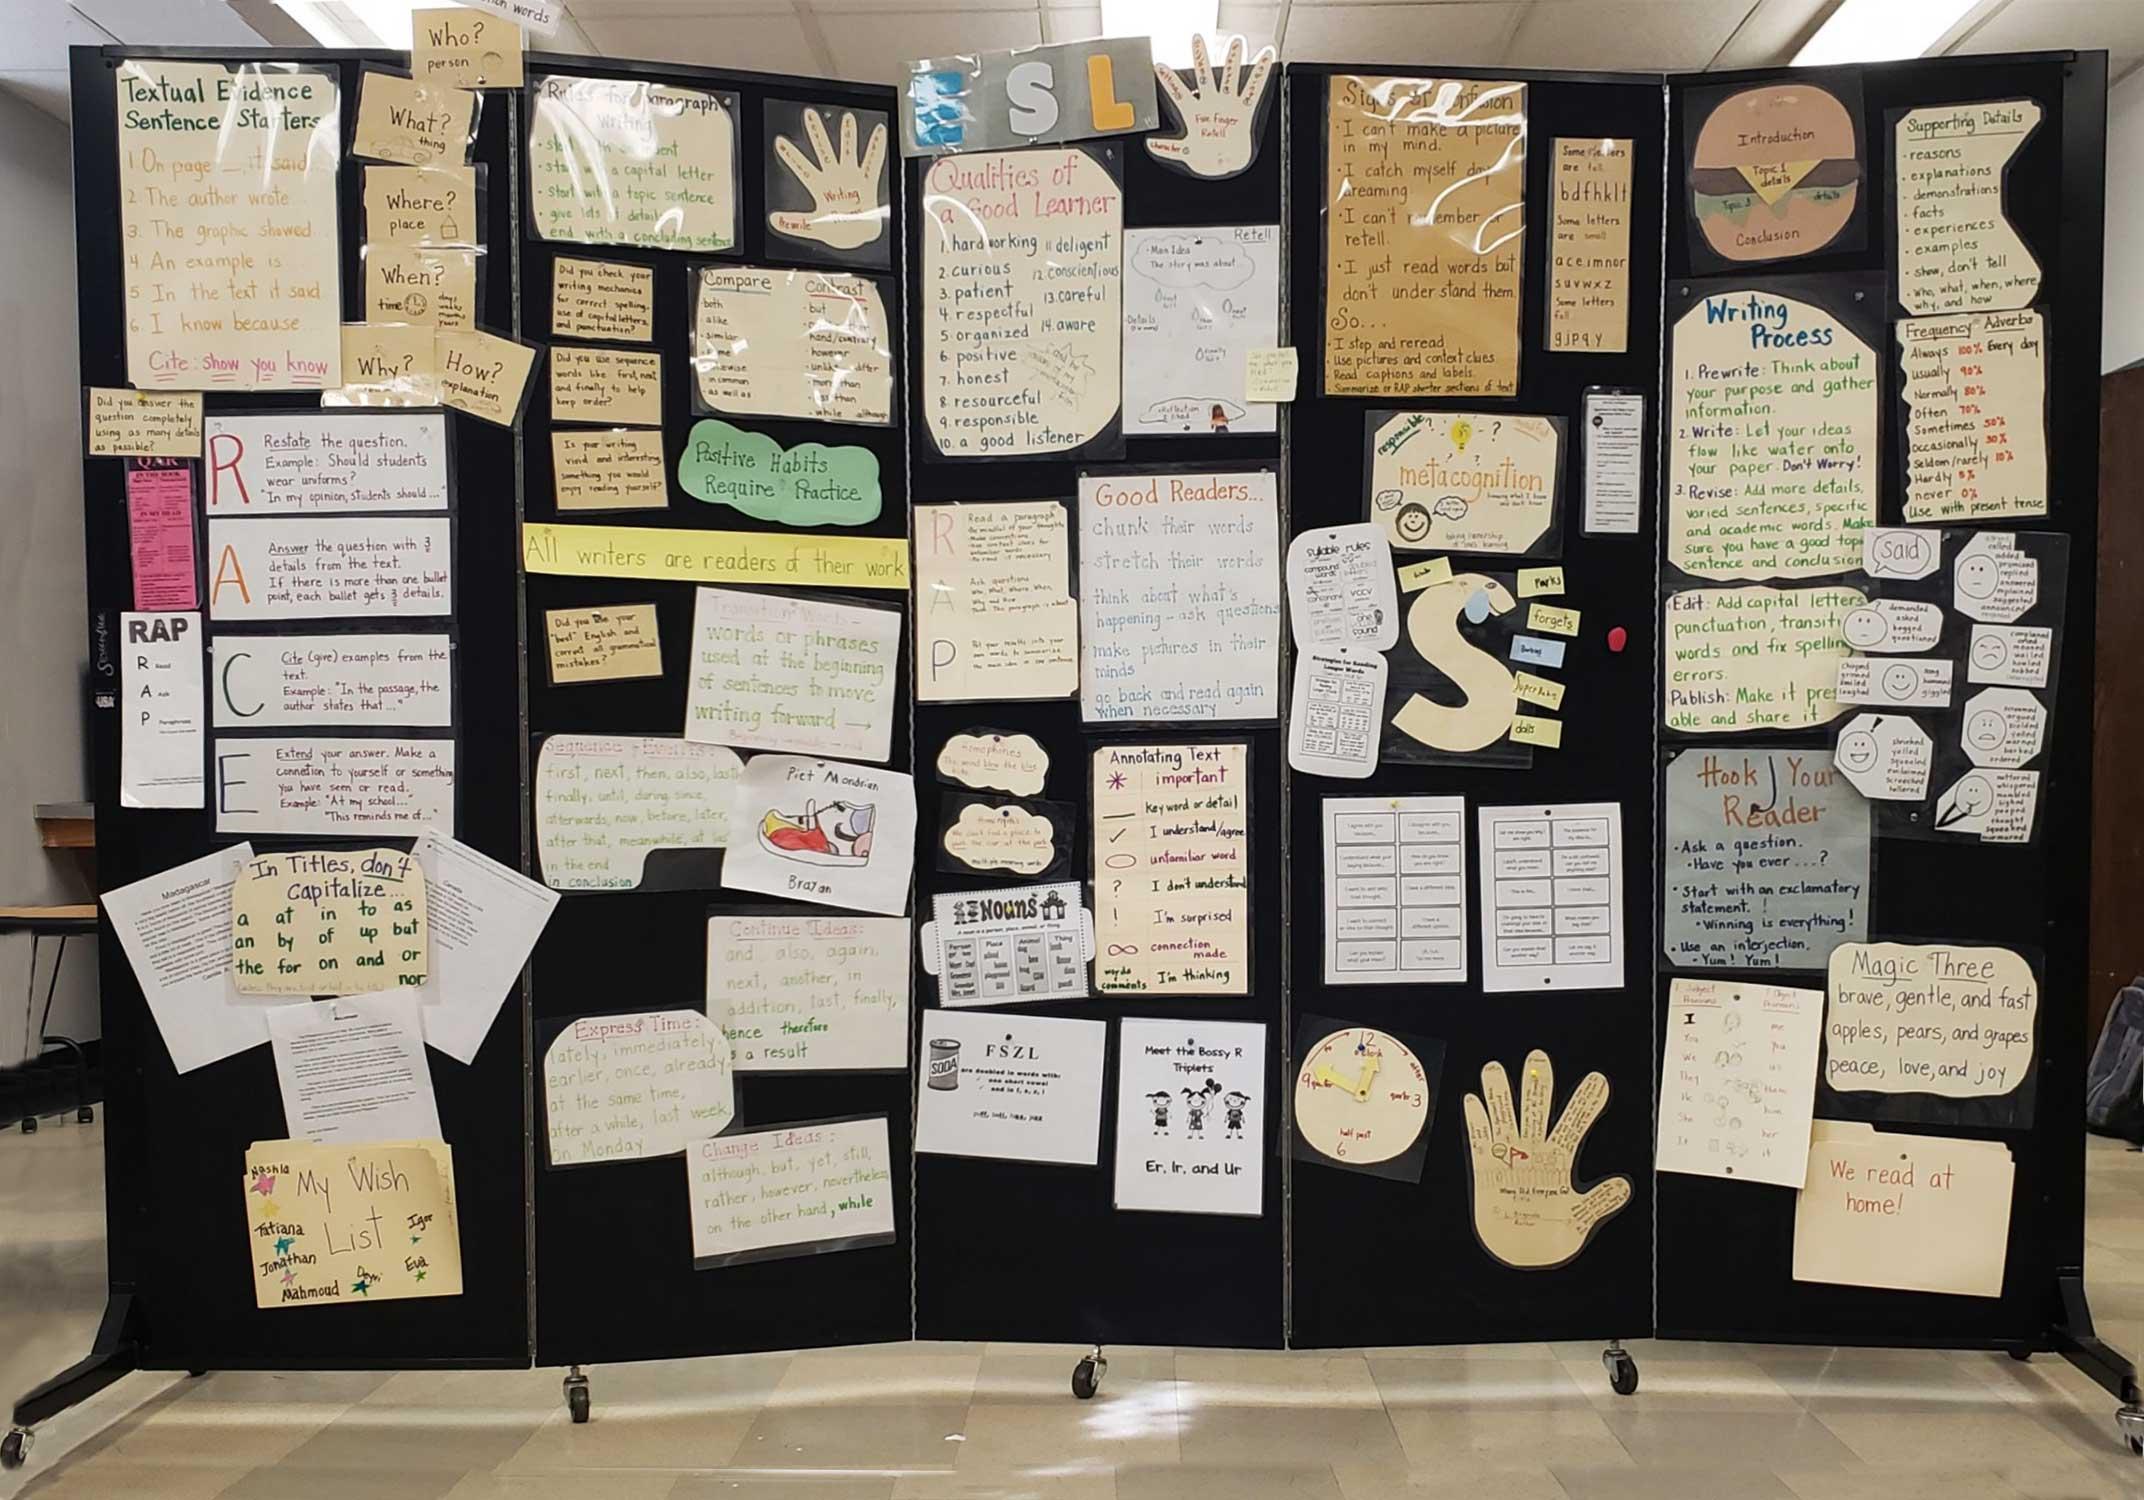 Student artwork covers a black 5-panel art display wall